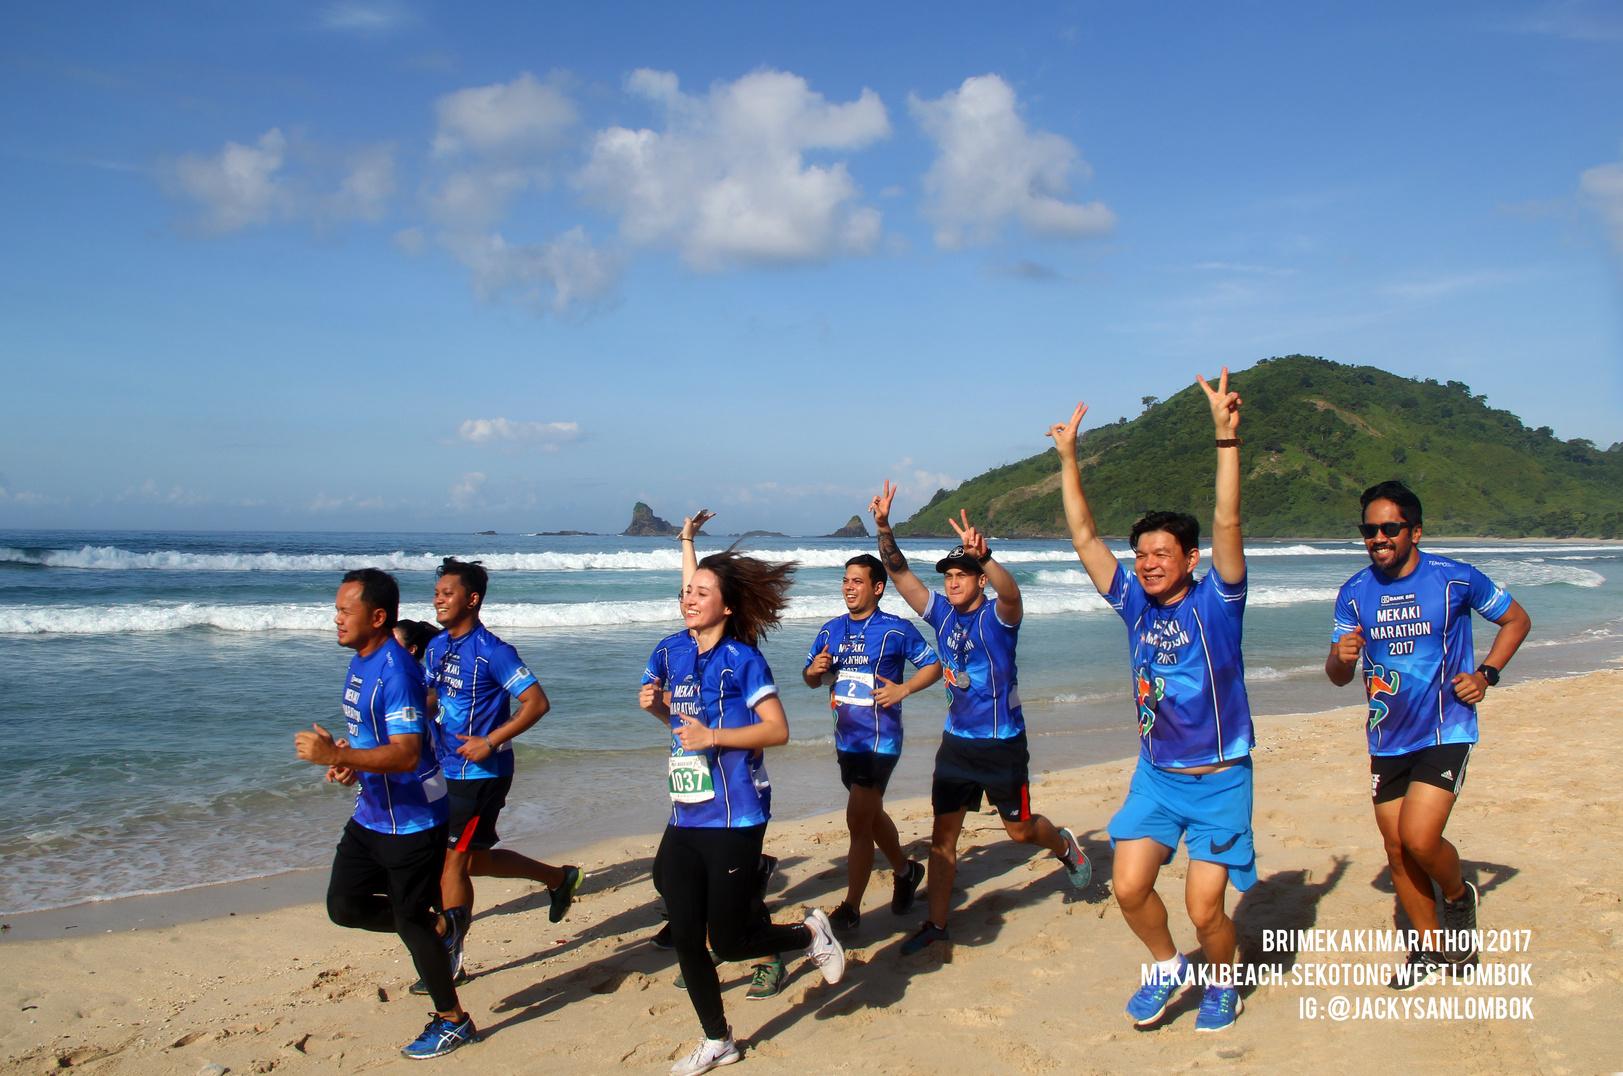 Photo of BRI Mekaki Marathon 2017 Menyisakan Sejuta Kenangan